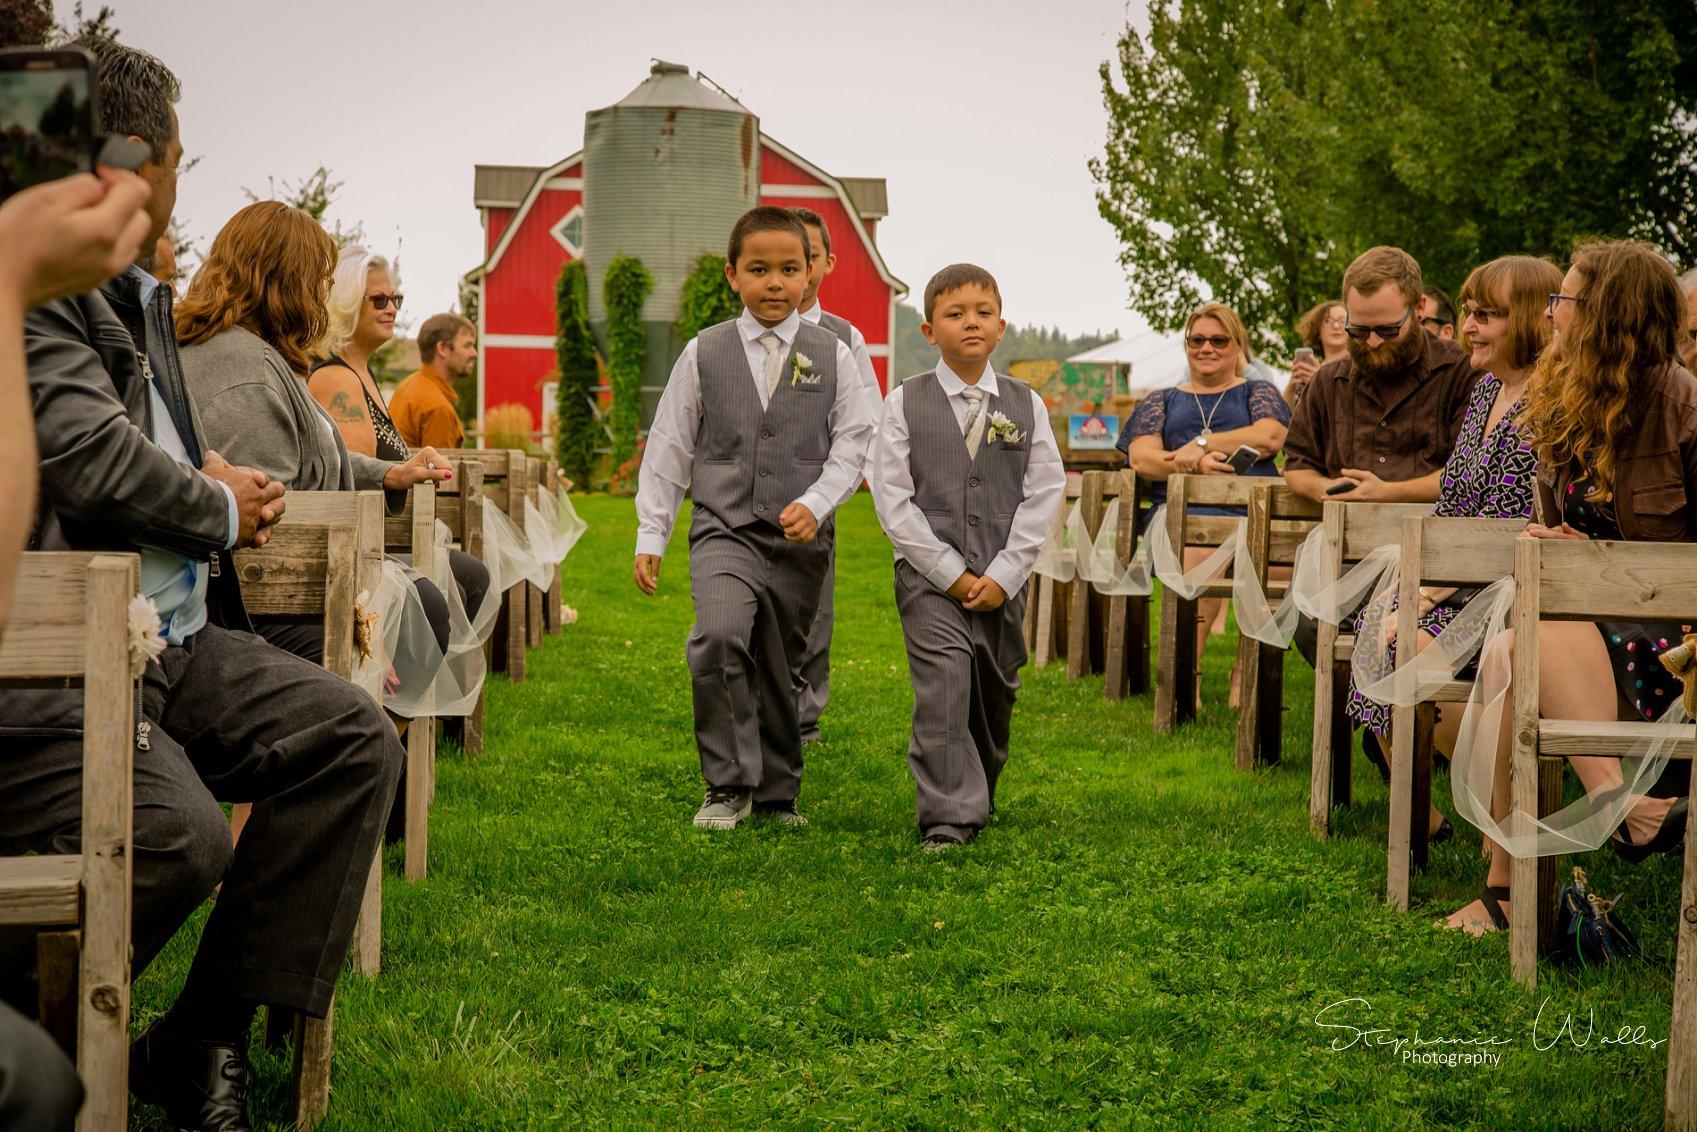 Kimble Wedding 094 Marlena & Allans | Snohomish Red Barn Events (Stocker Farms) | Snohomish, Wa Wedding Photographer